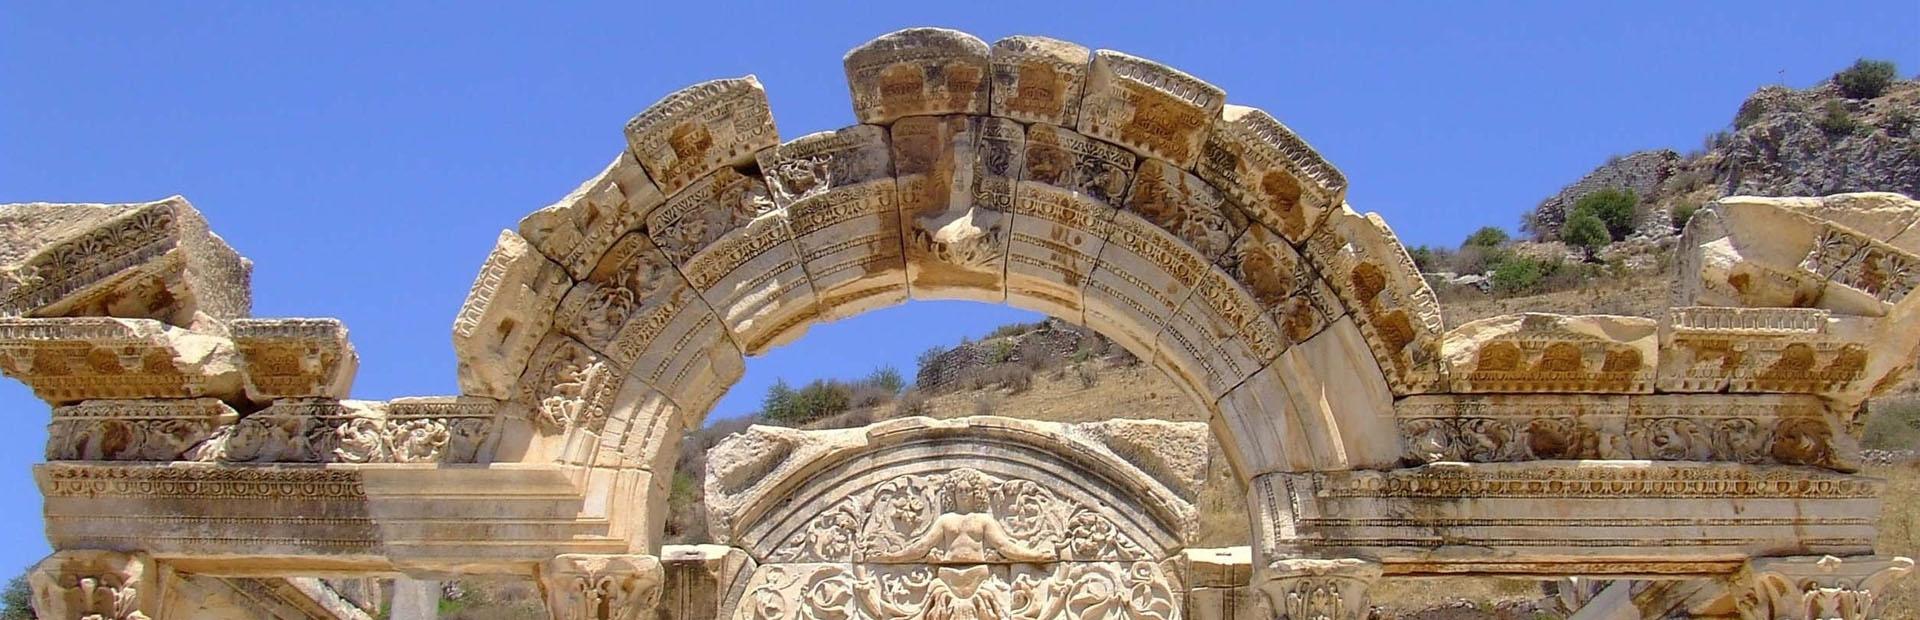 TempleHadrianEphesus